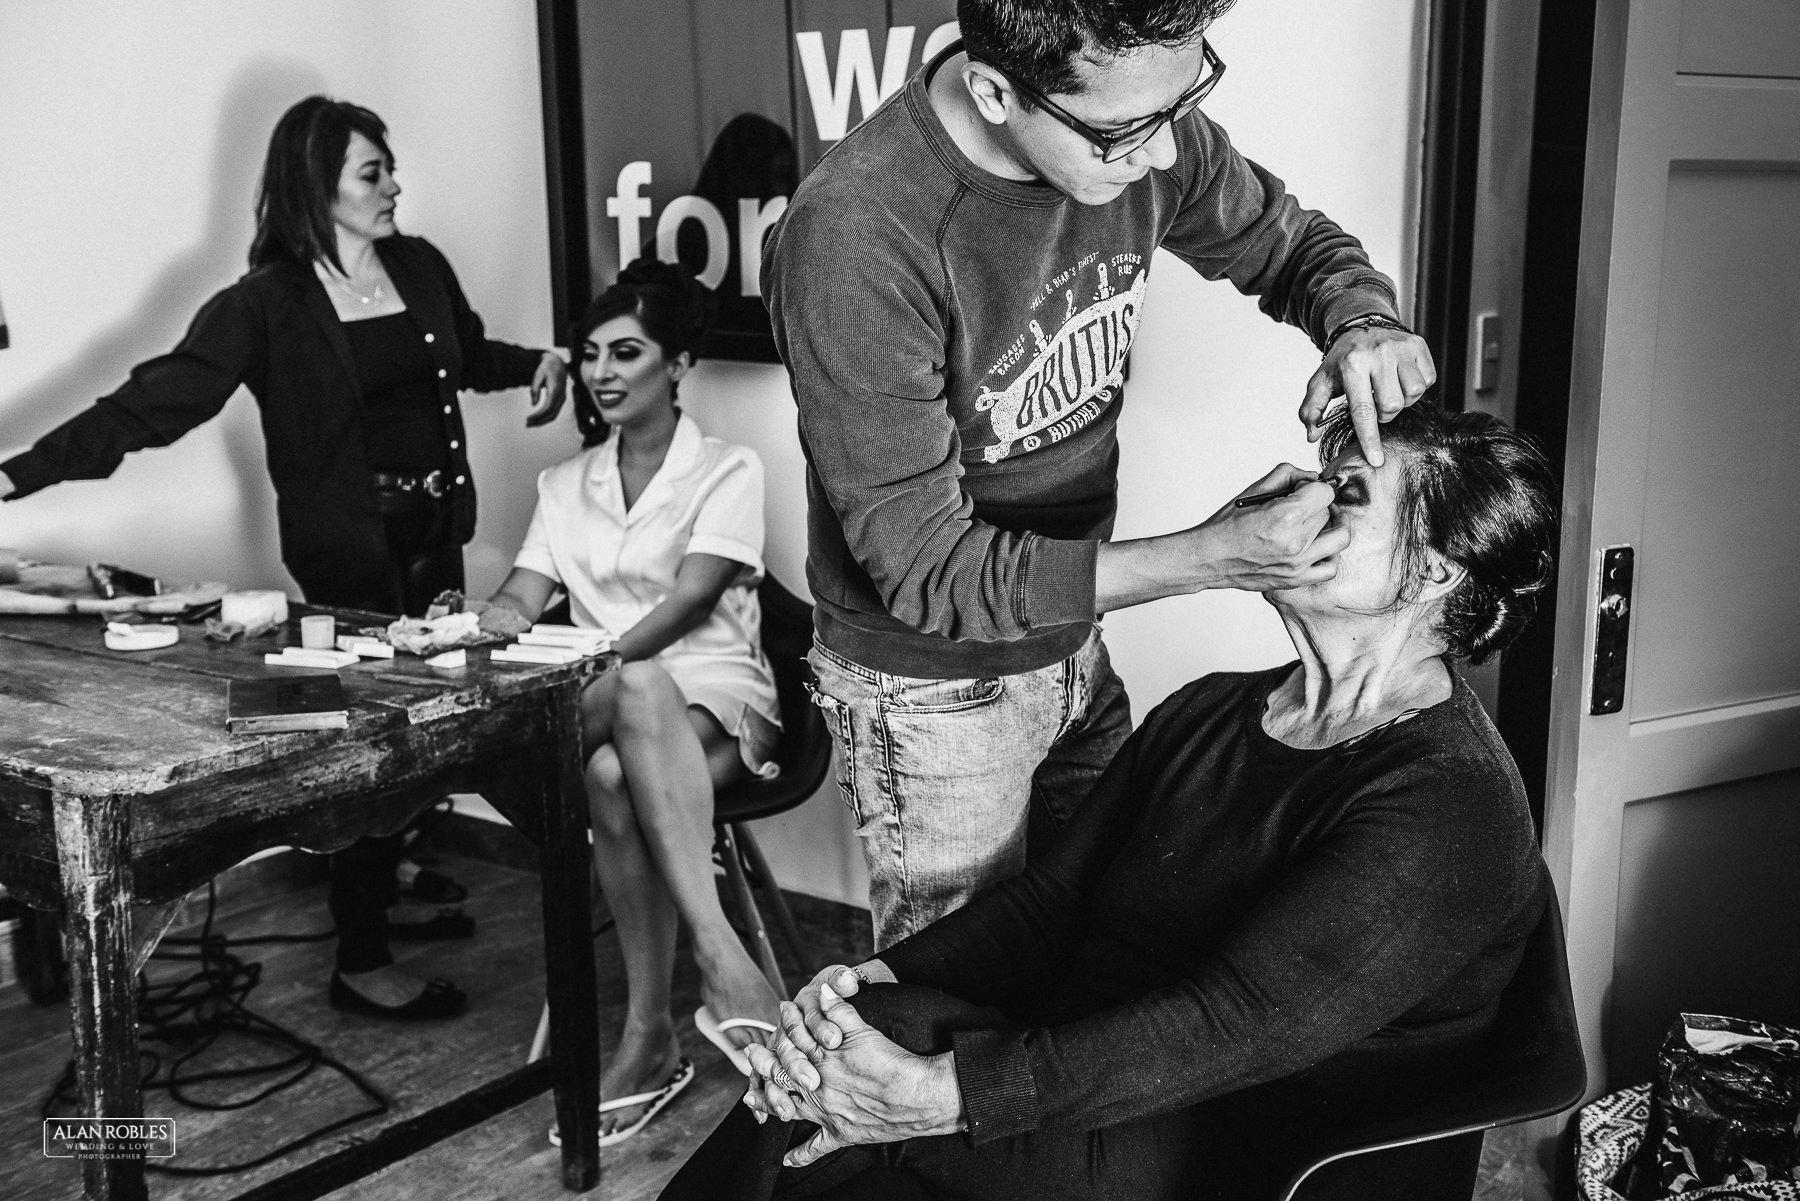 Alan Robles fotografo de bodas guadalajara - LyP Hotel Demetria-15